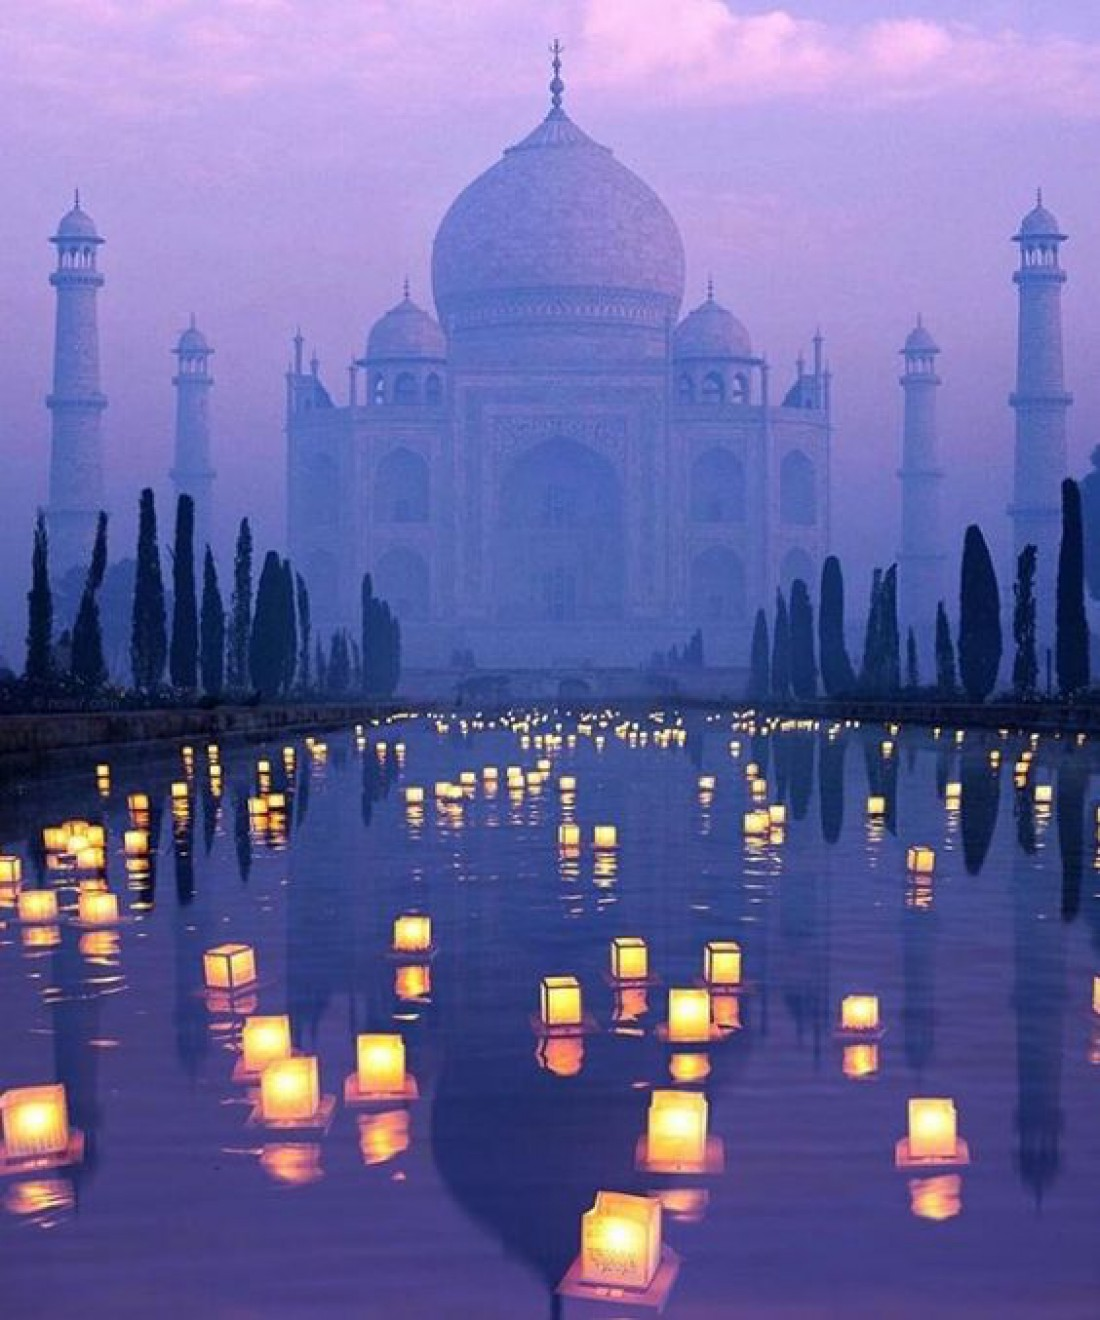 Тадж-Махал - сердце и символ всей Индии